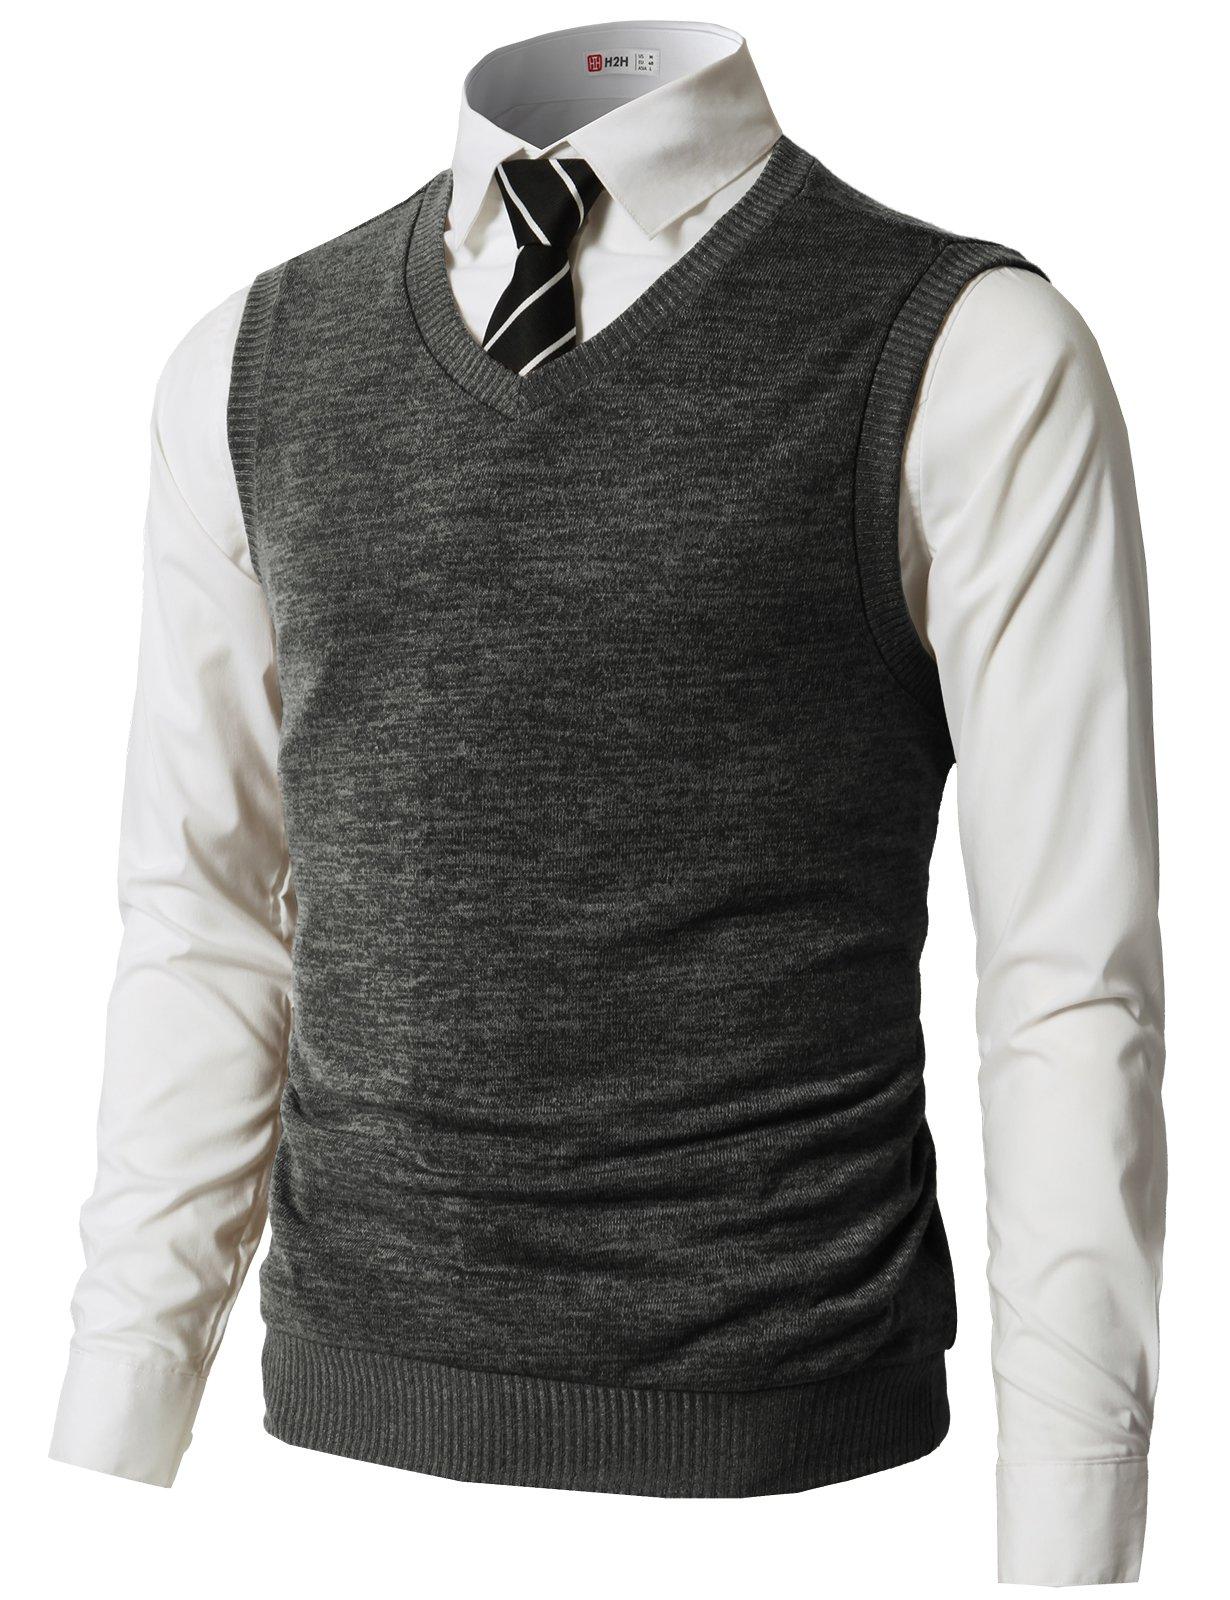 H2H Men's Heather Diamond-Texture Stitch V-Neck Vest Charcoal US L/Asia XL (CMOV042) by H2H